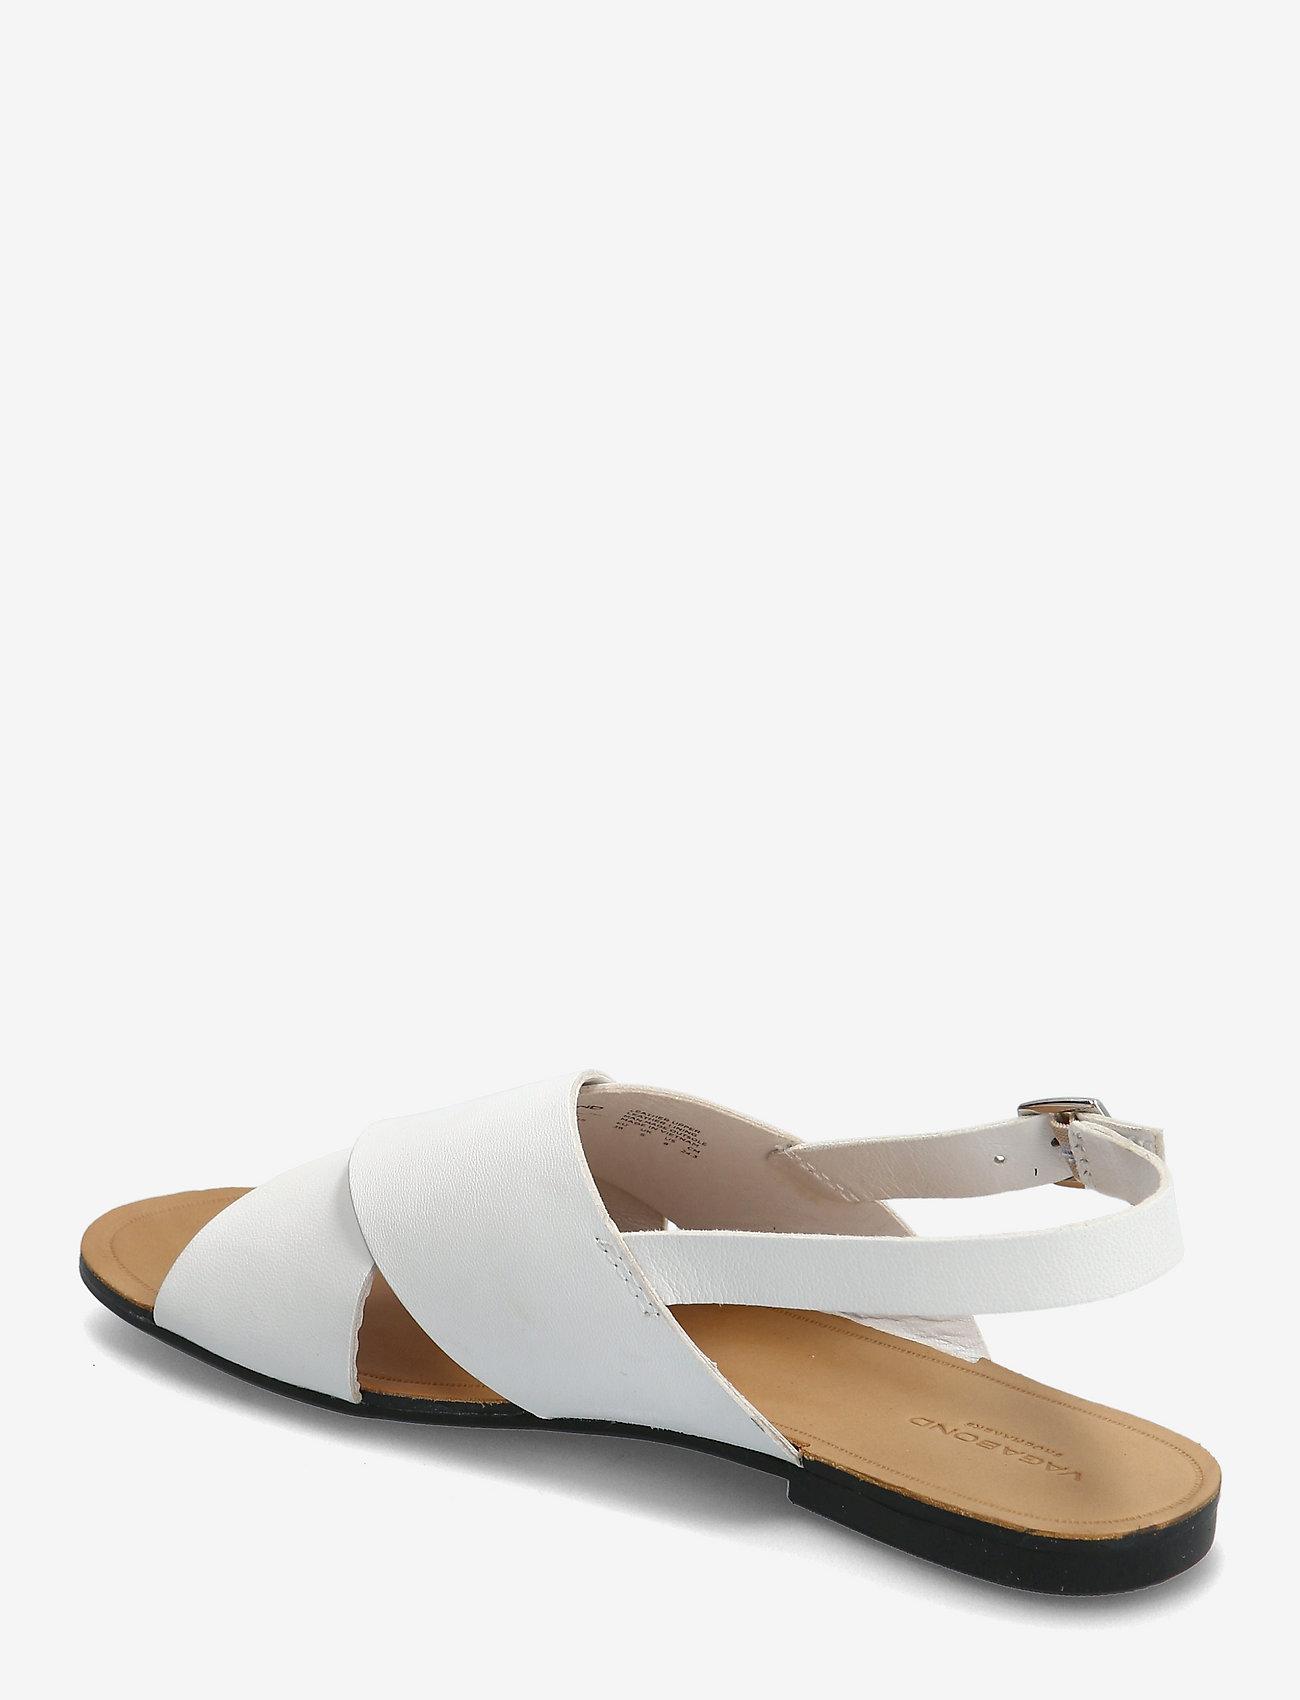 VAGABOND - TIA - płaskie sandały - white - 2